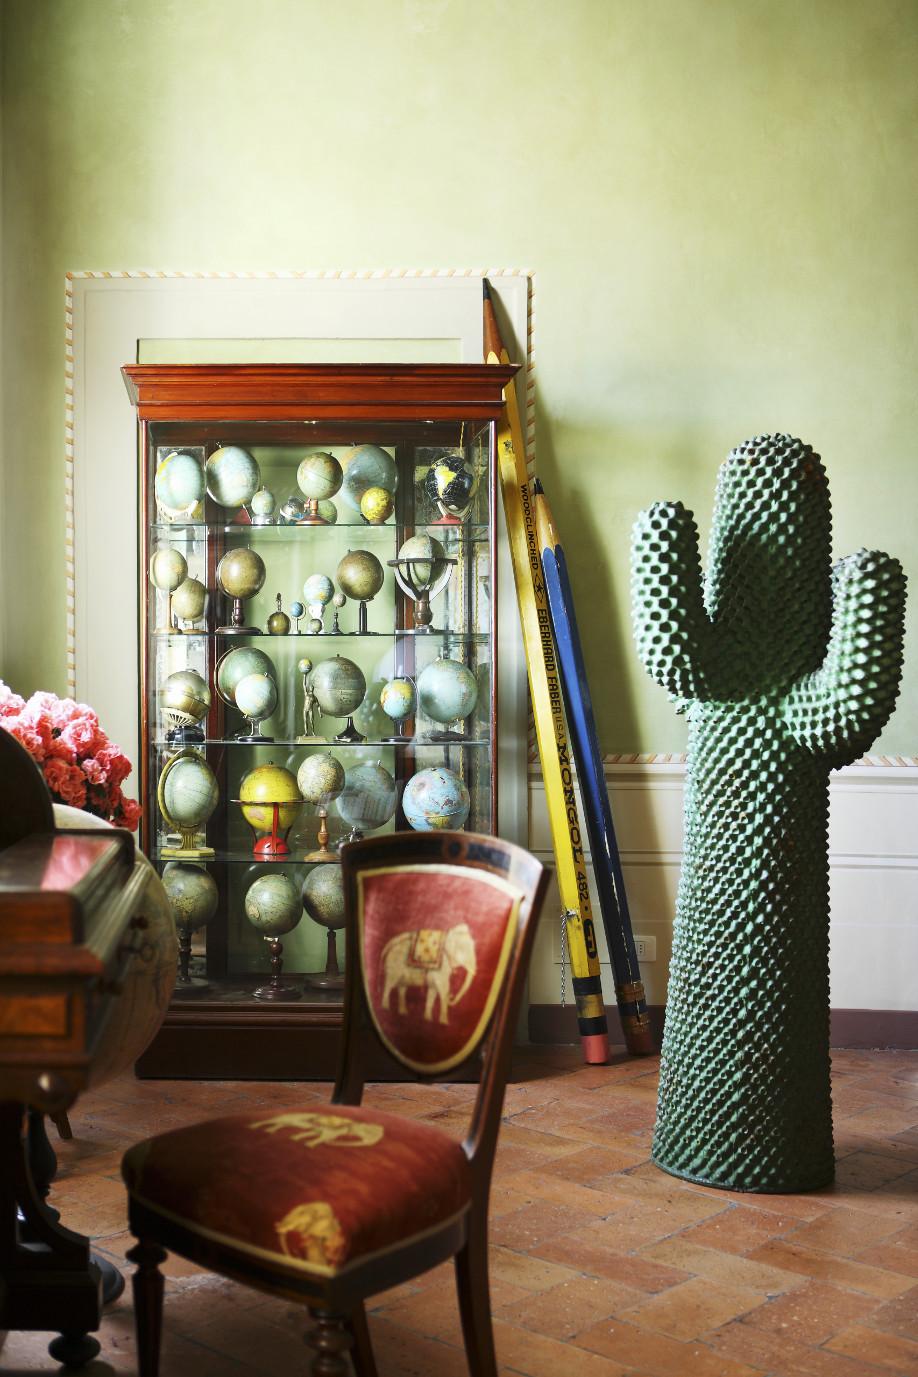 westwing-dobry-humor-kaktus